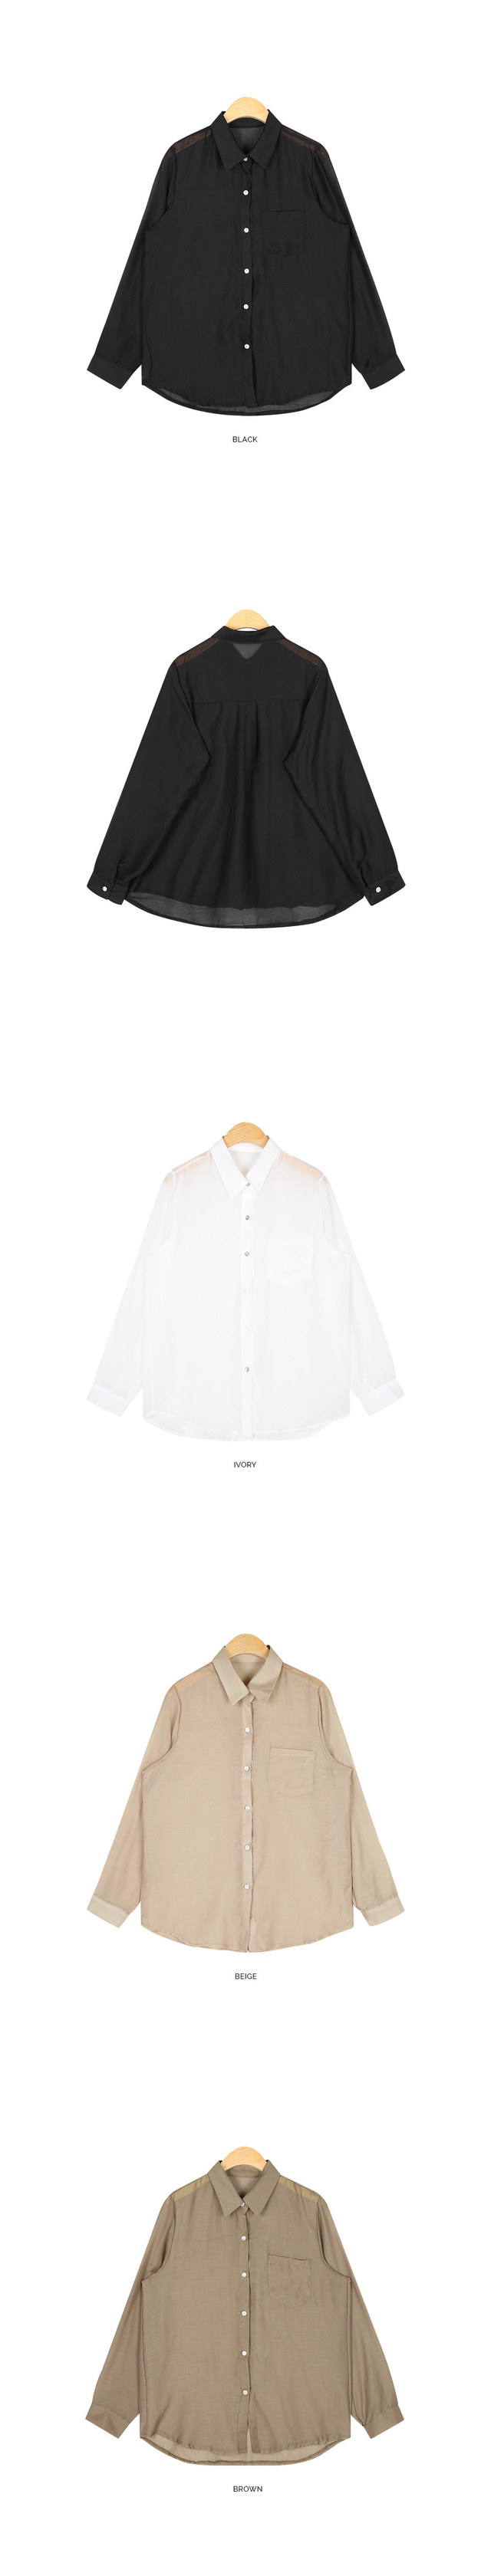 slik see-through shirts